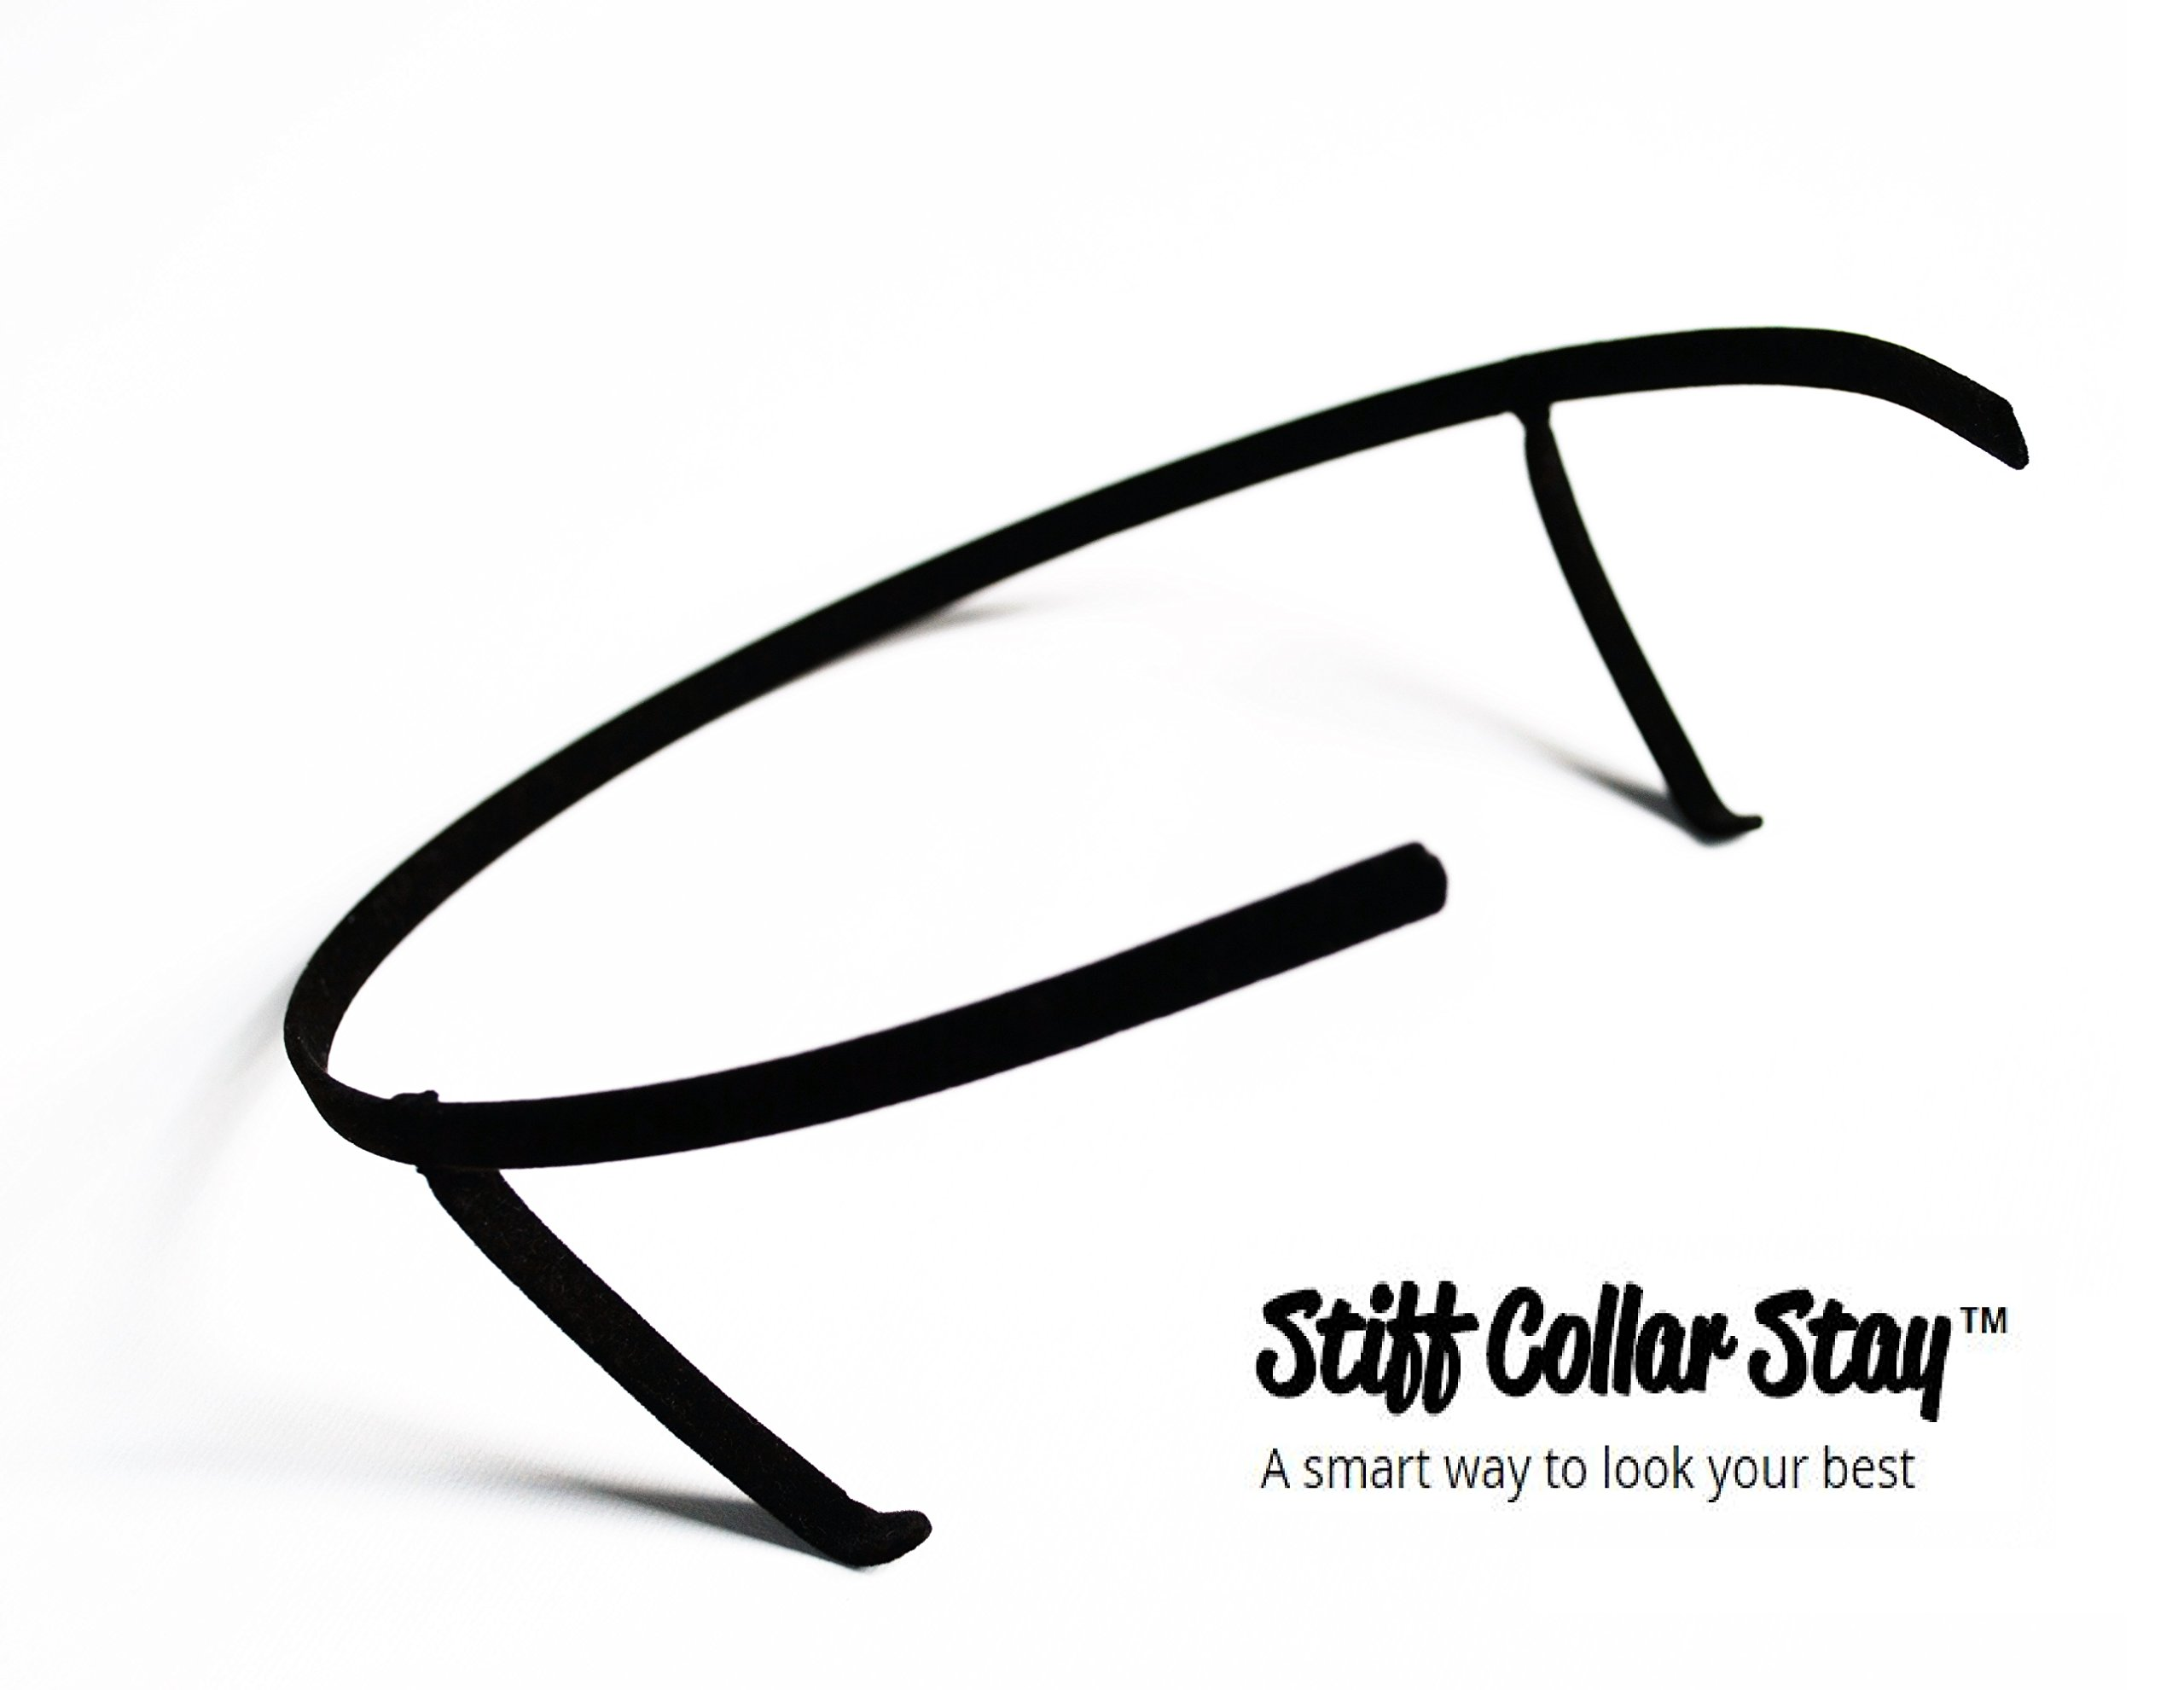 Collar stays - Stiff Collar Stay - 2 pcs (19.5 & 20)